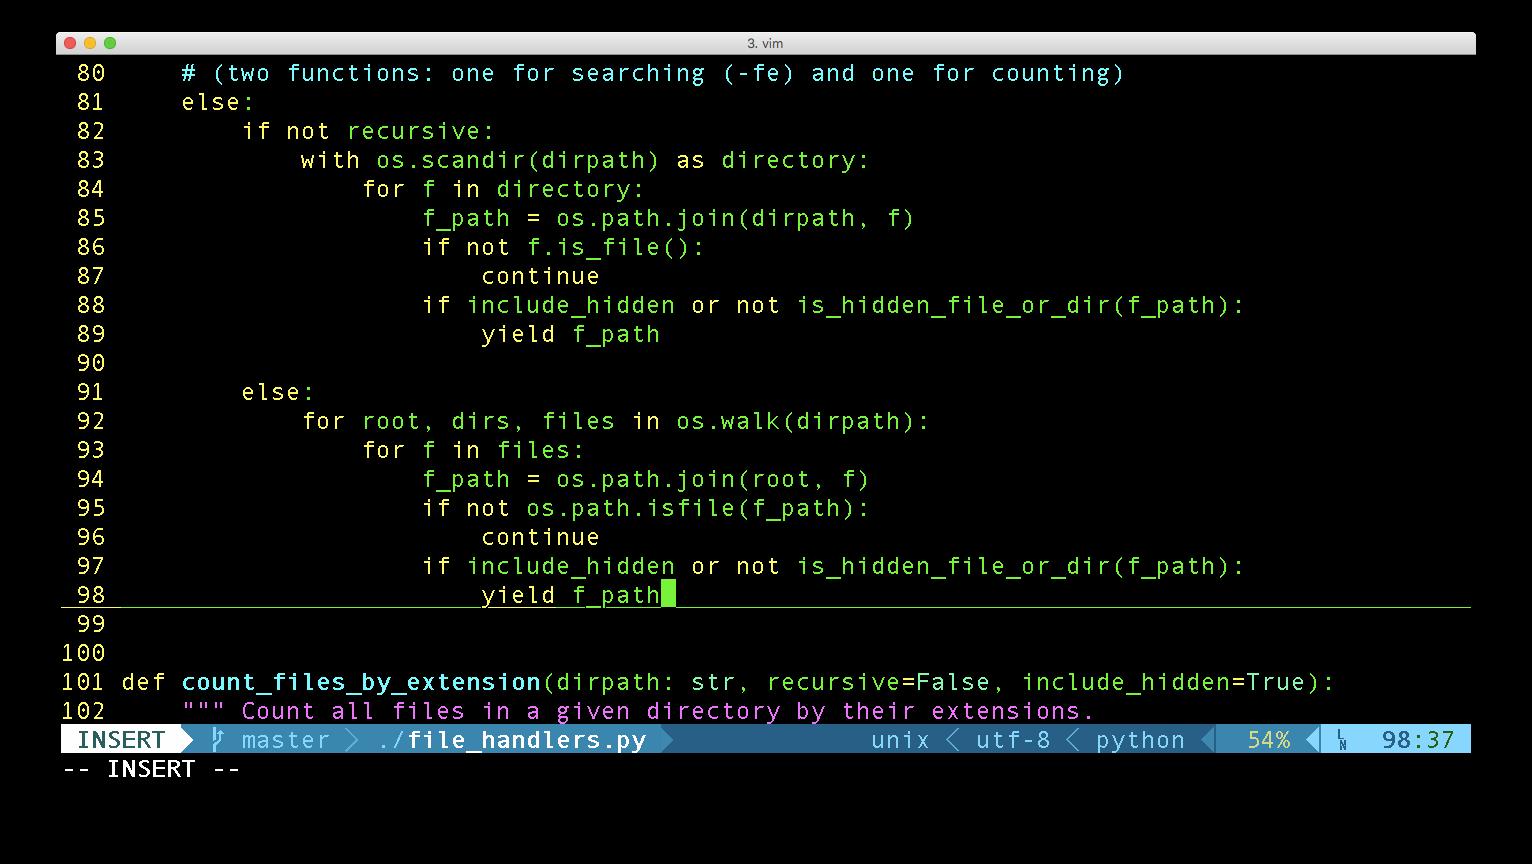 Python generators aregreat!